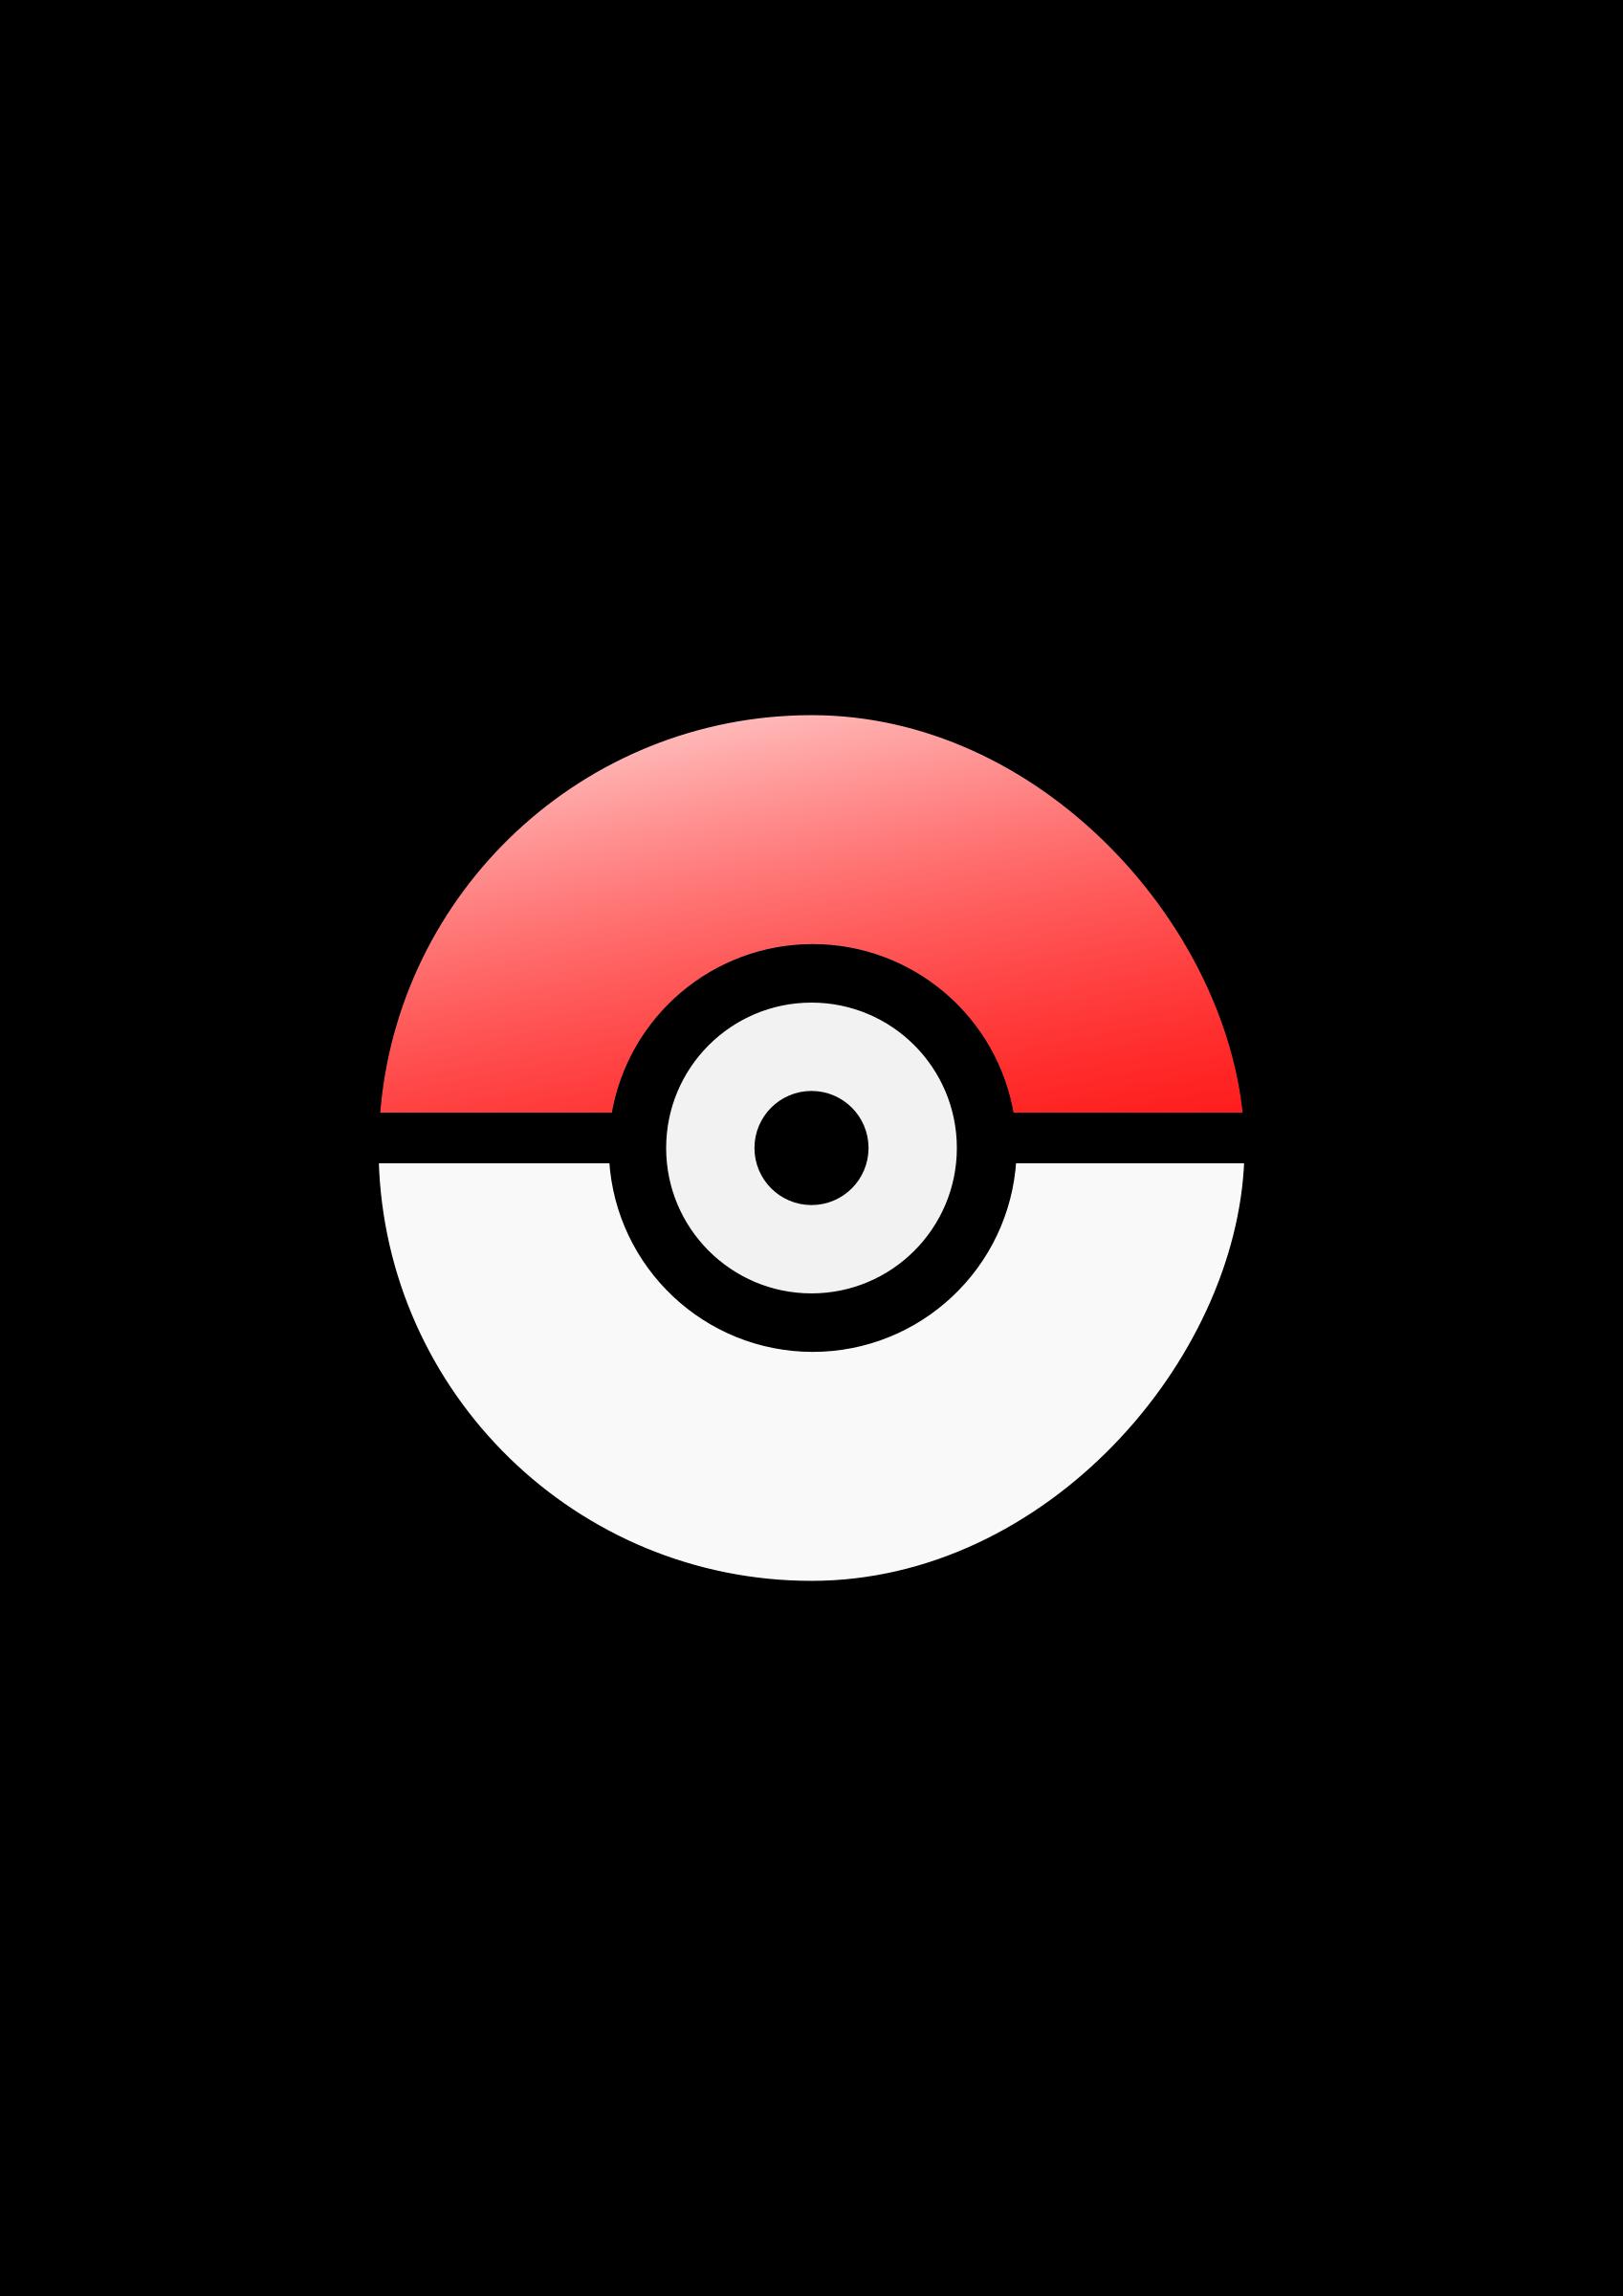 pokemon pokeball vector graphic image free stock photo public